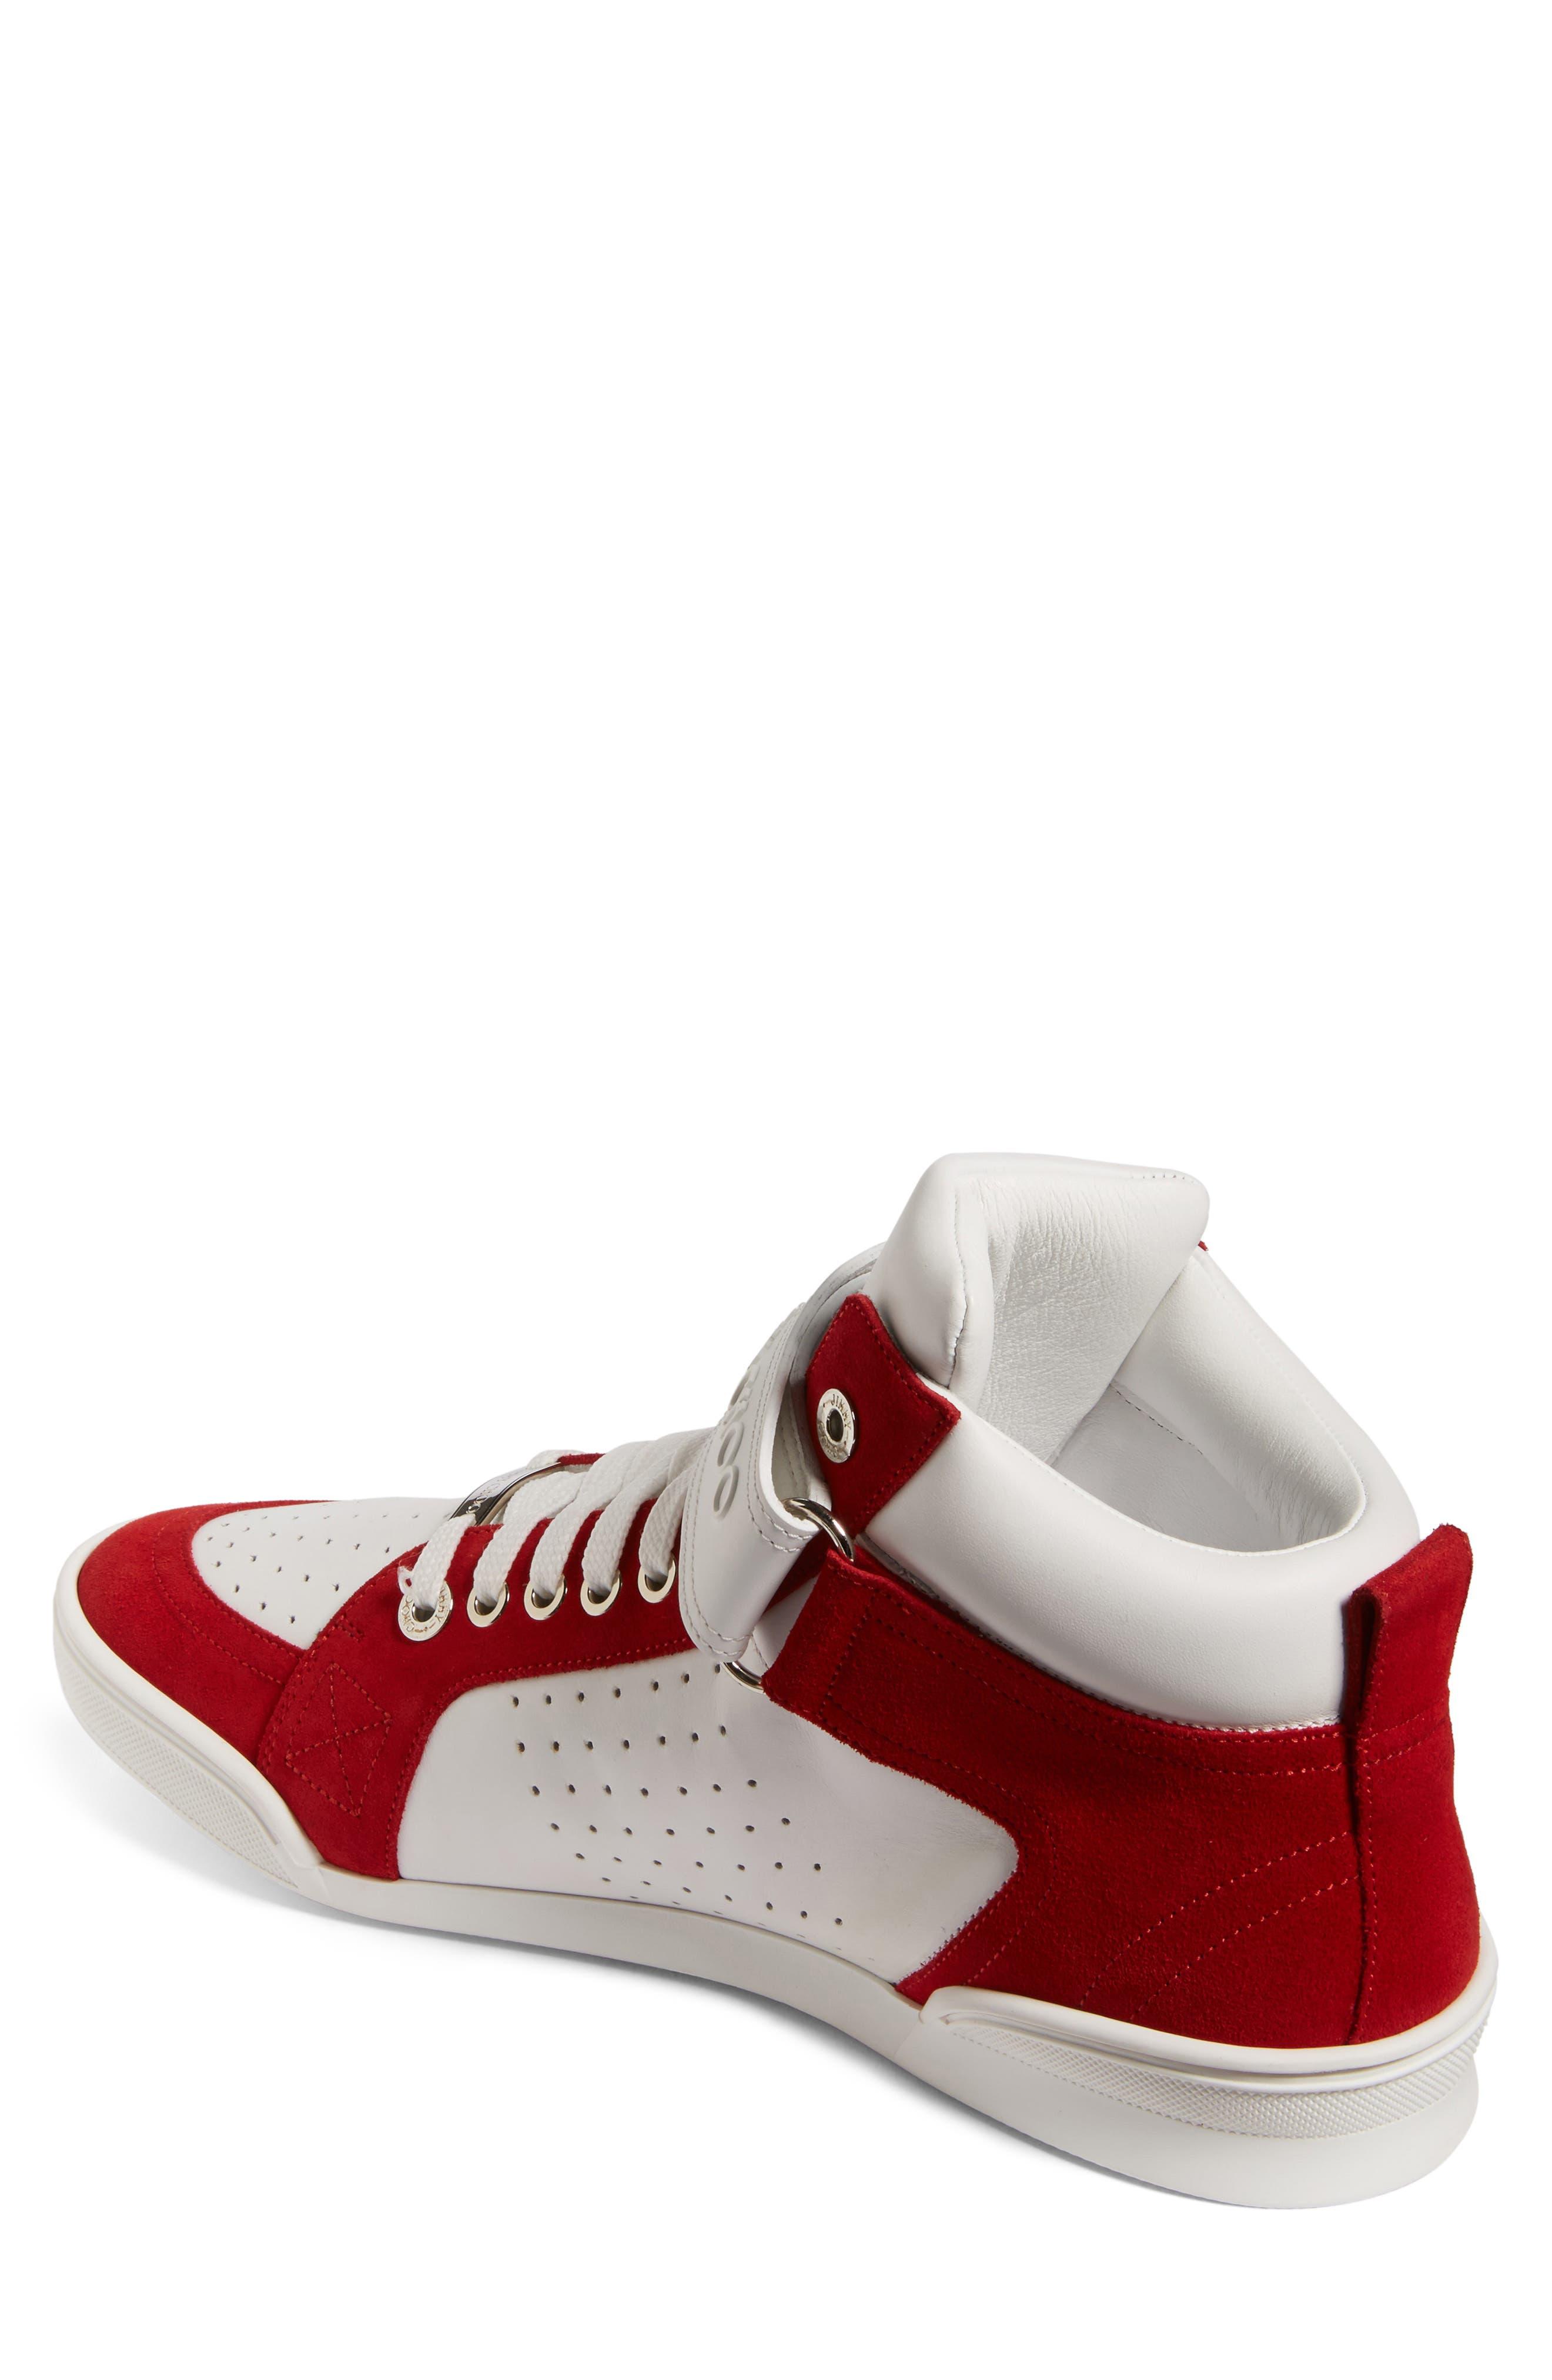 Lewis Sneaker,                             Alternate thumbnail 2, color,                             100